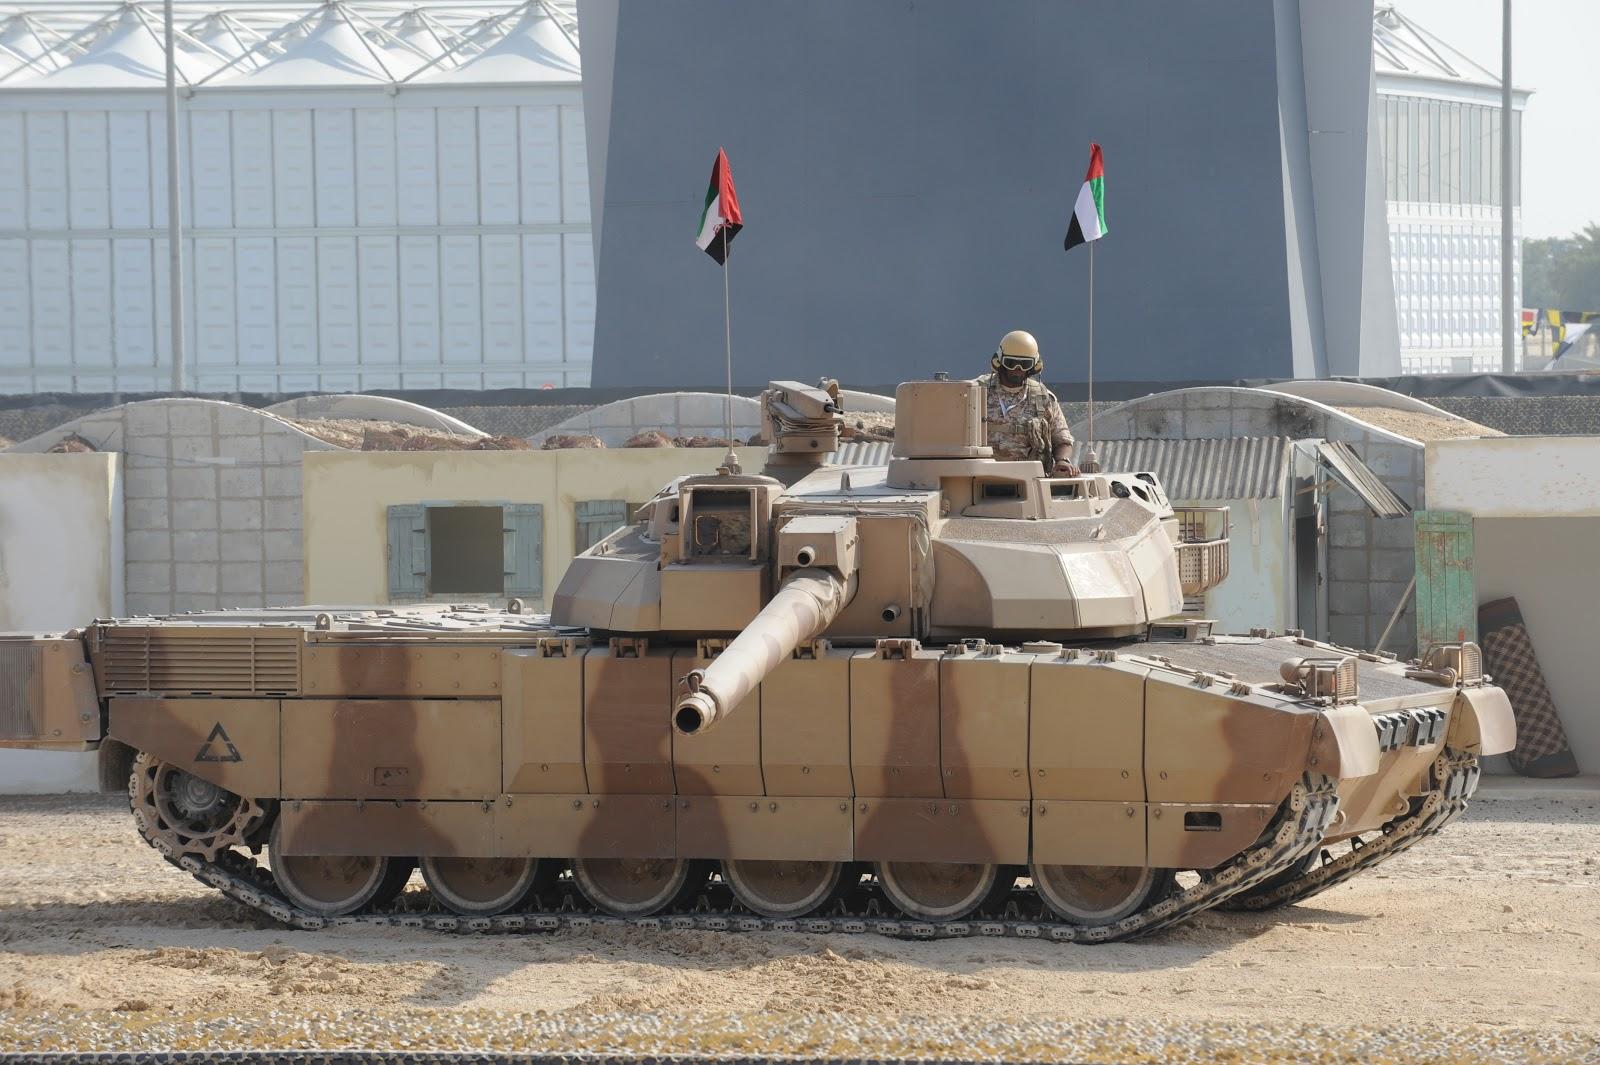 Armée des Emirats Arabe Unis AMX+Leclerc%252C+is+a+main+battle+tank+%2528MBT%2529+army+of+the+United+Arab+Emirates.+Leclerc+used+by+the+Army+Forces+of+United+Arab+Emirates.++%25284%2529